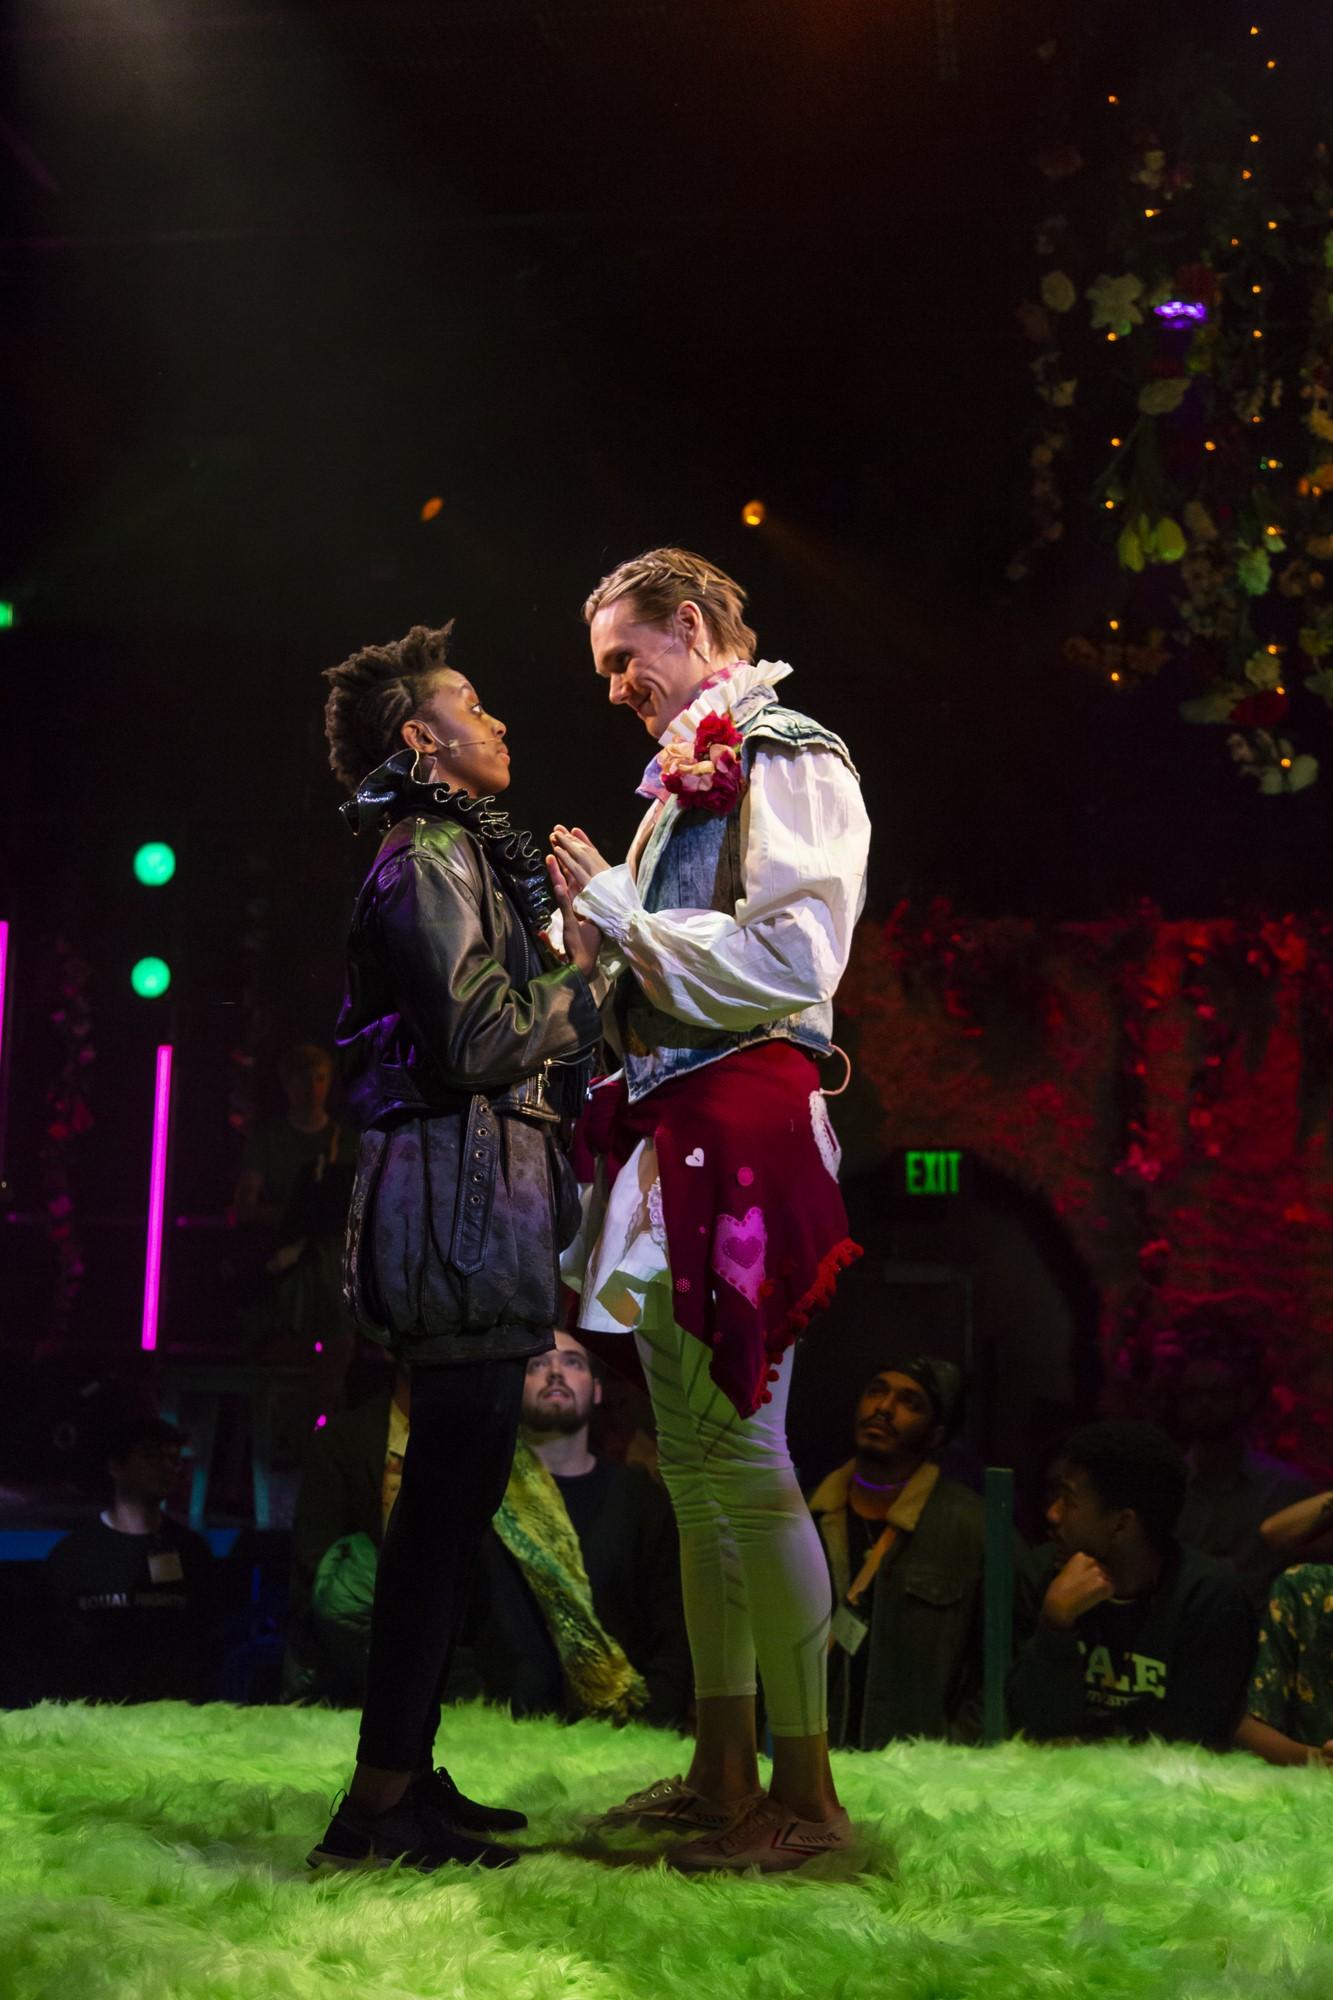 Rosalind as Ganymede (Amandla Jahava), Orlando (Hudson Oznowicz) in  shakespeare's as u like it  adapted by Emma Weinstein and Michael Breslin, directed by Emma Weinstein (Photo by T. Charles Erickson, 2018)